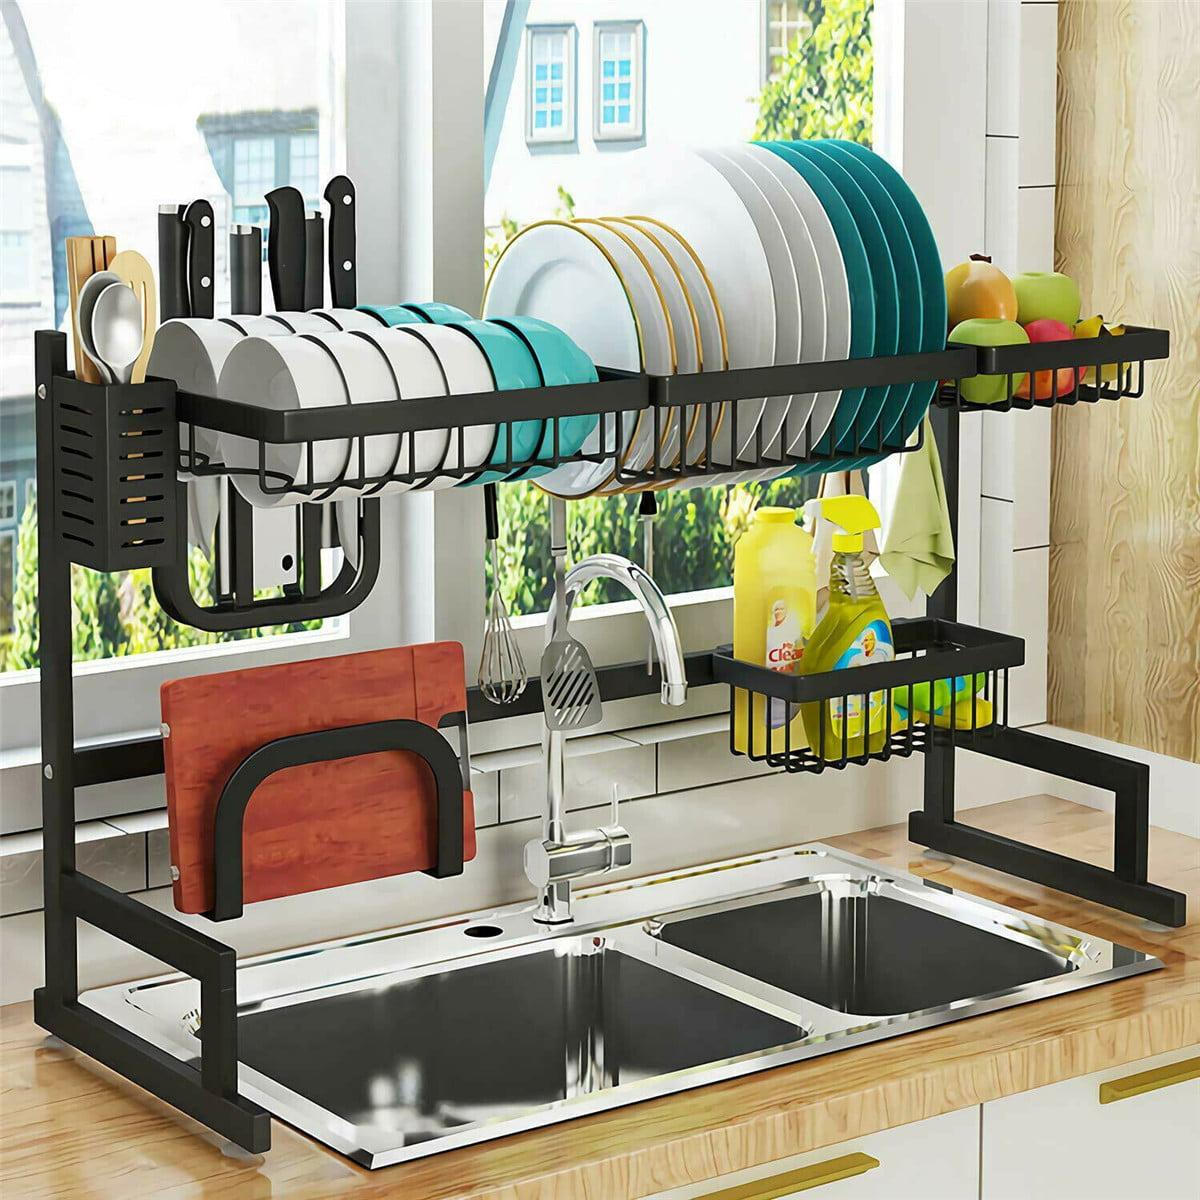 Sink Rack Dish Drainer Stainless Steel Over The Sink Shelf Storage Rack For Kitchen Counter Organization Walmart Com Walmart Com